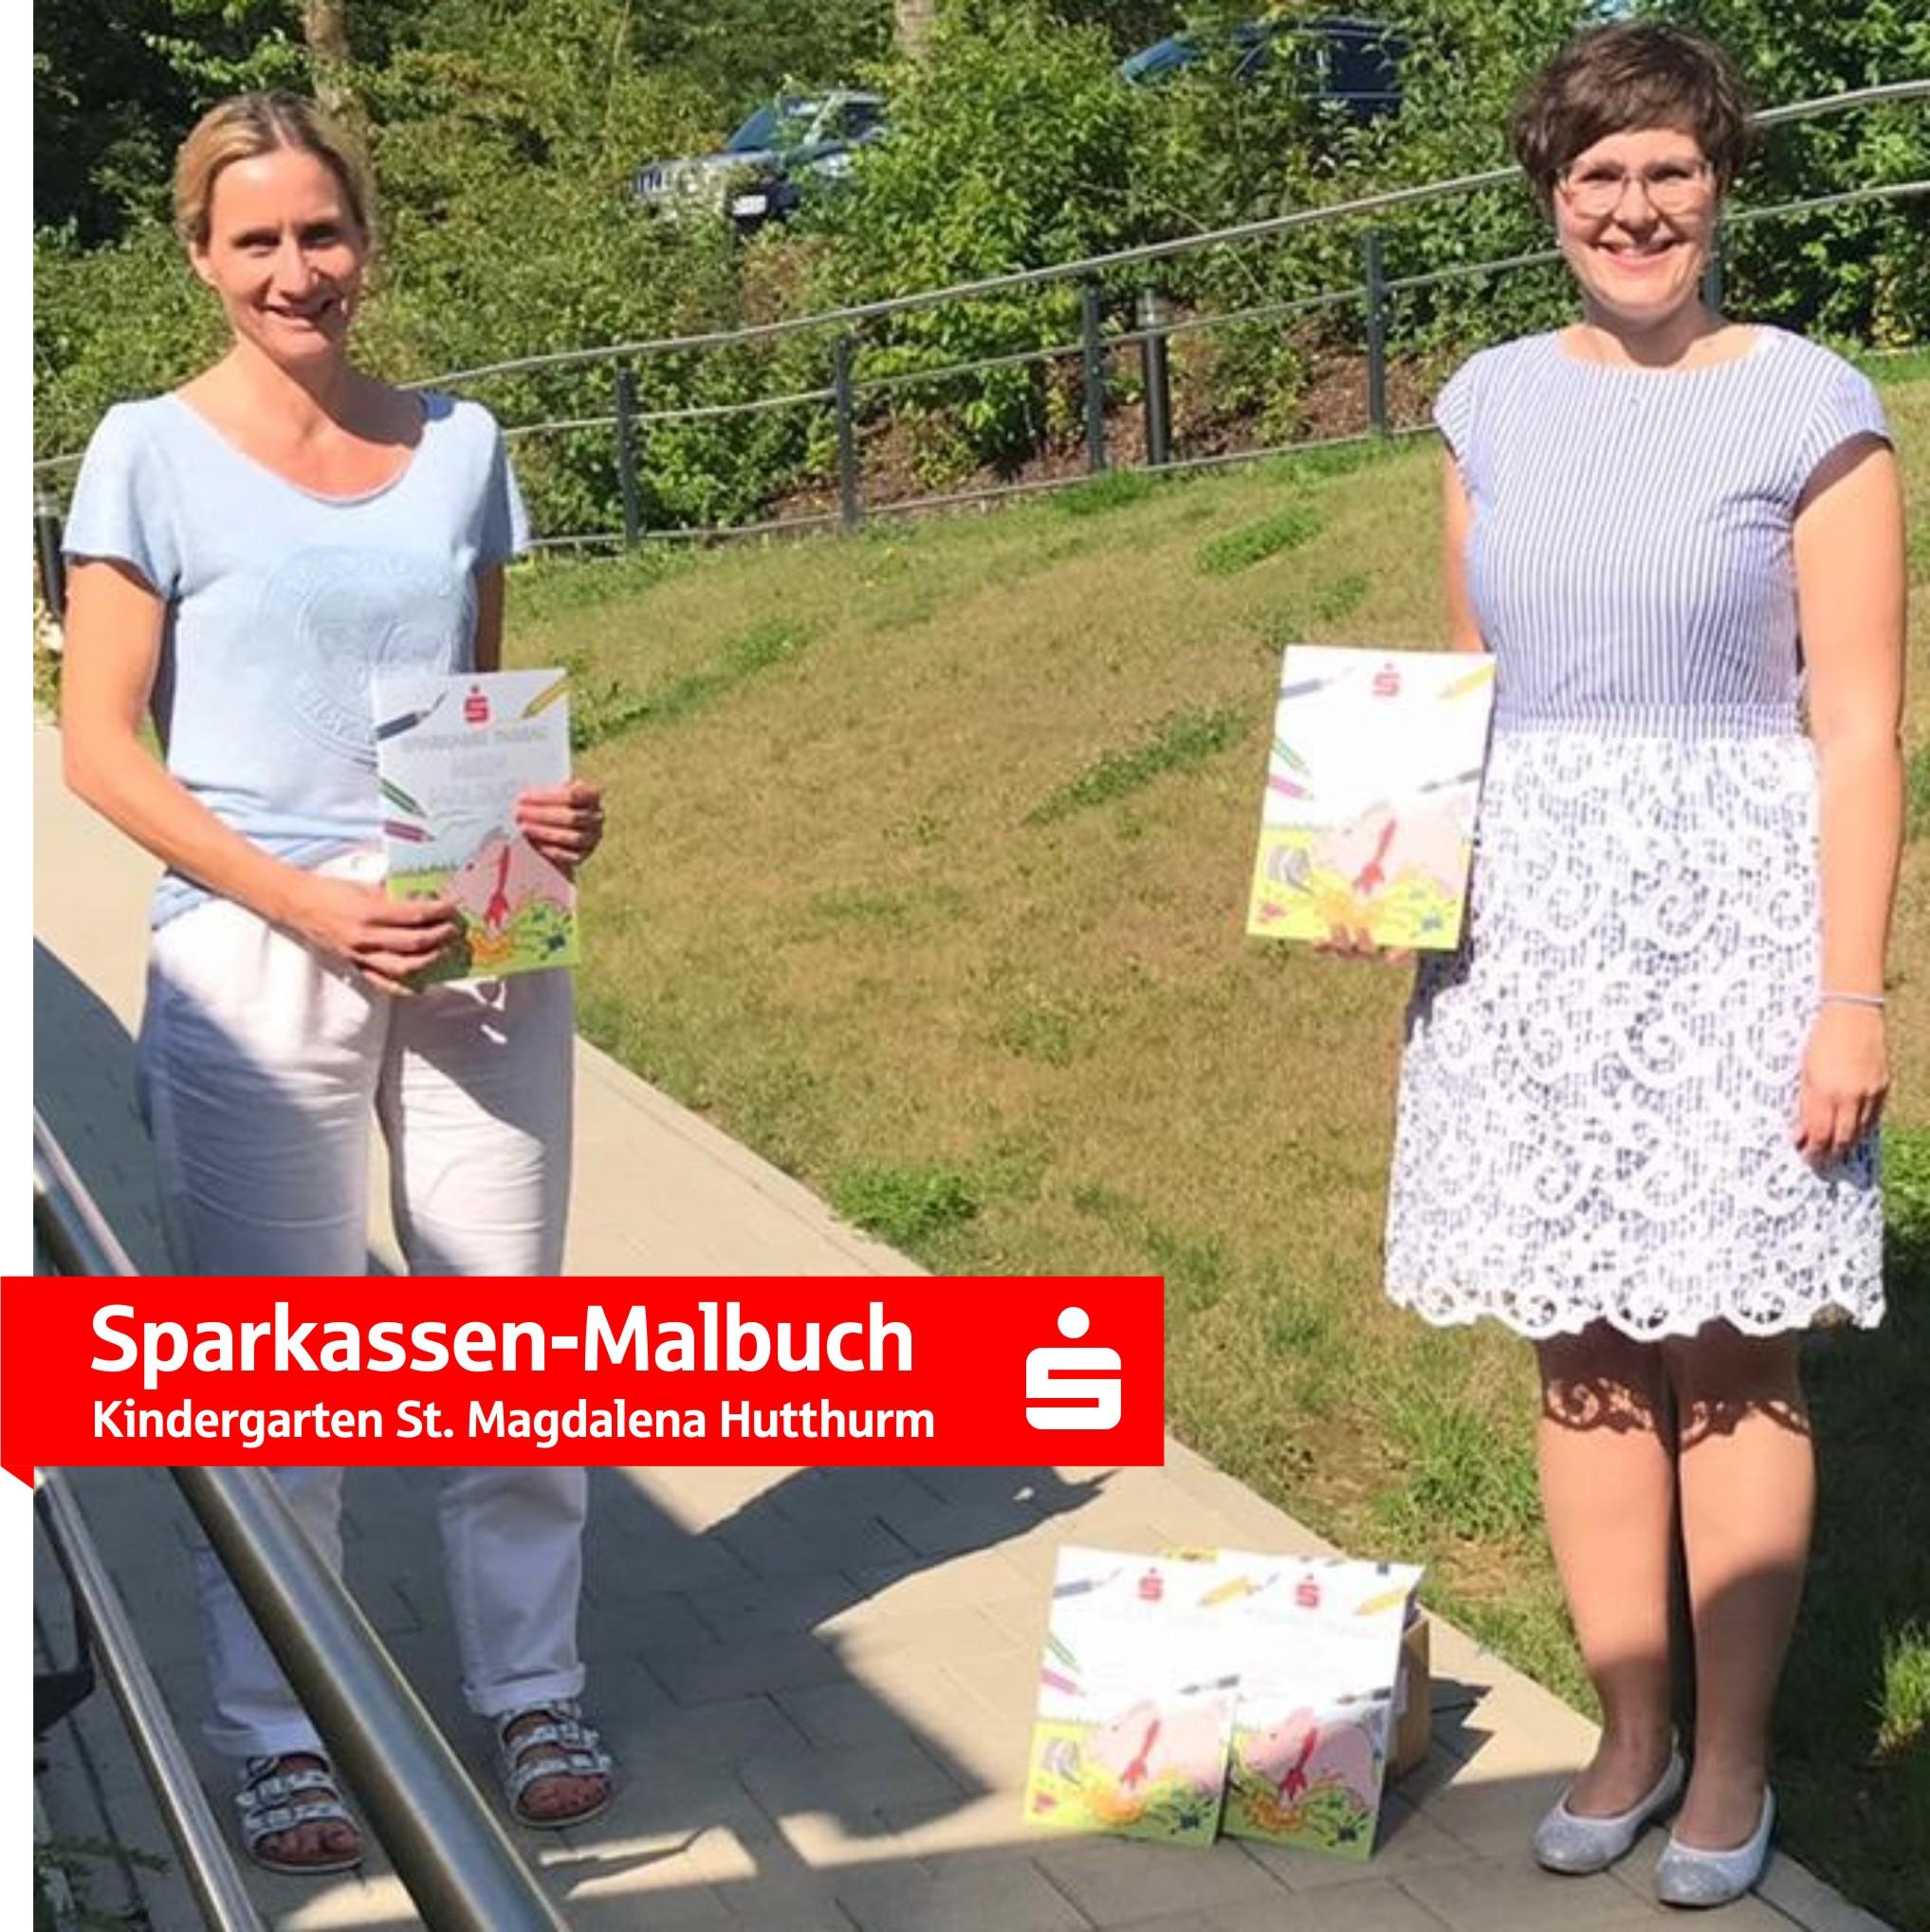 020_Hutthurm_Kindergarten-St.-Magdalena-Hutthurm